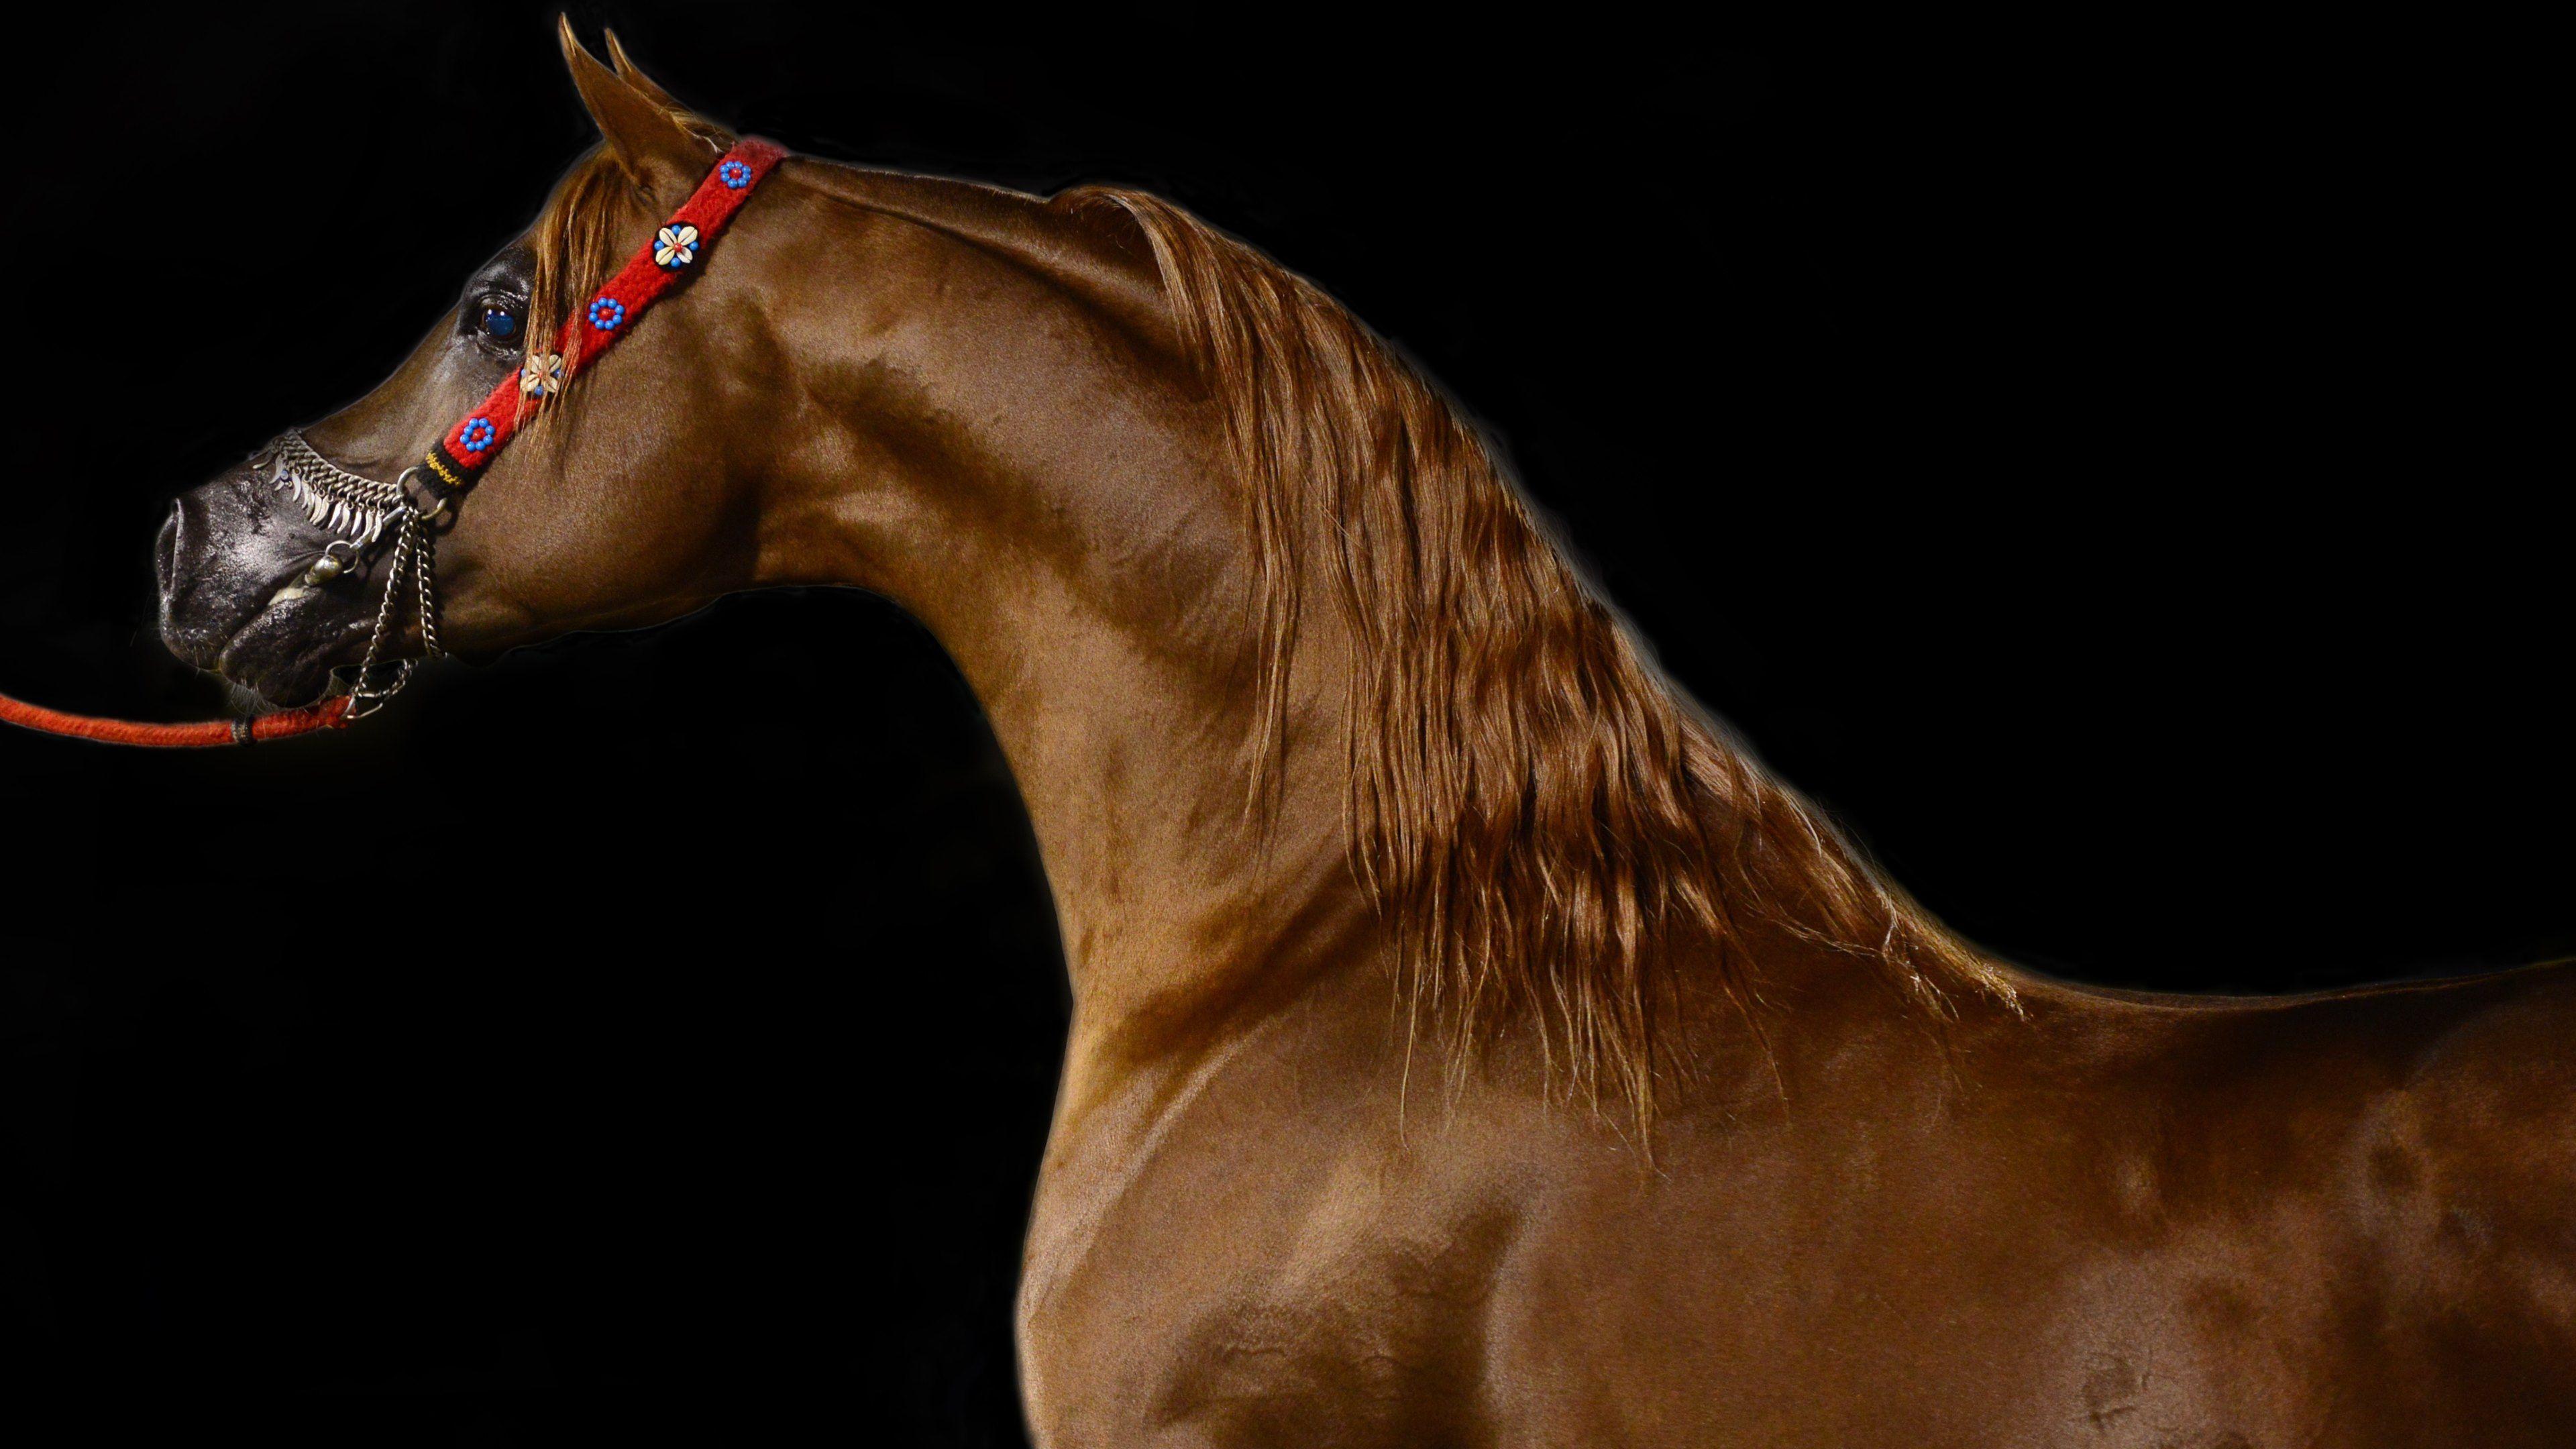 Great Wallpaper Horse Ultra Hd - 5fb1916ab73b67c1950846cbf58a3783  Pic_605811.jpg